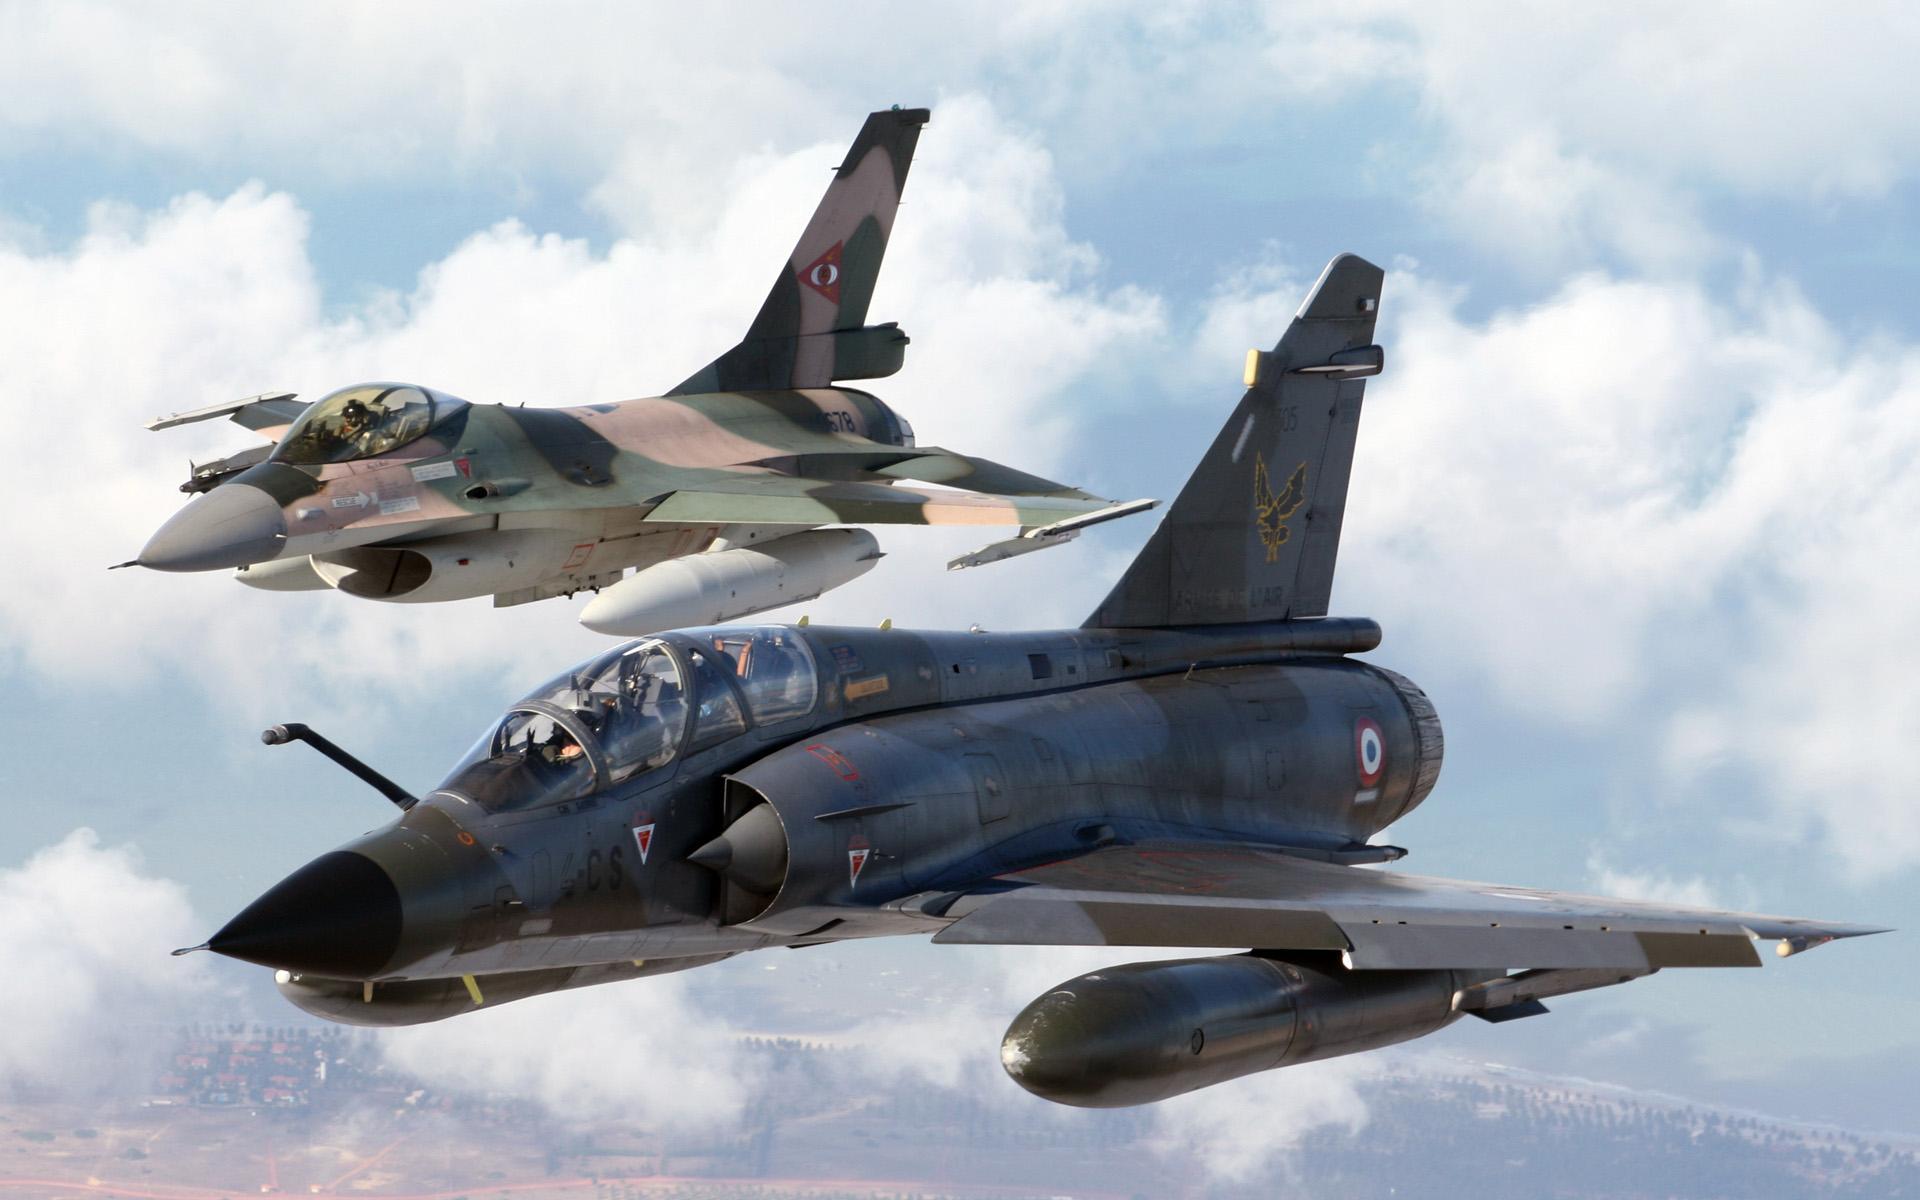 Jet Fighter Wallpaper HD Download